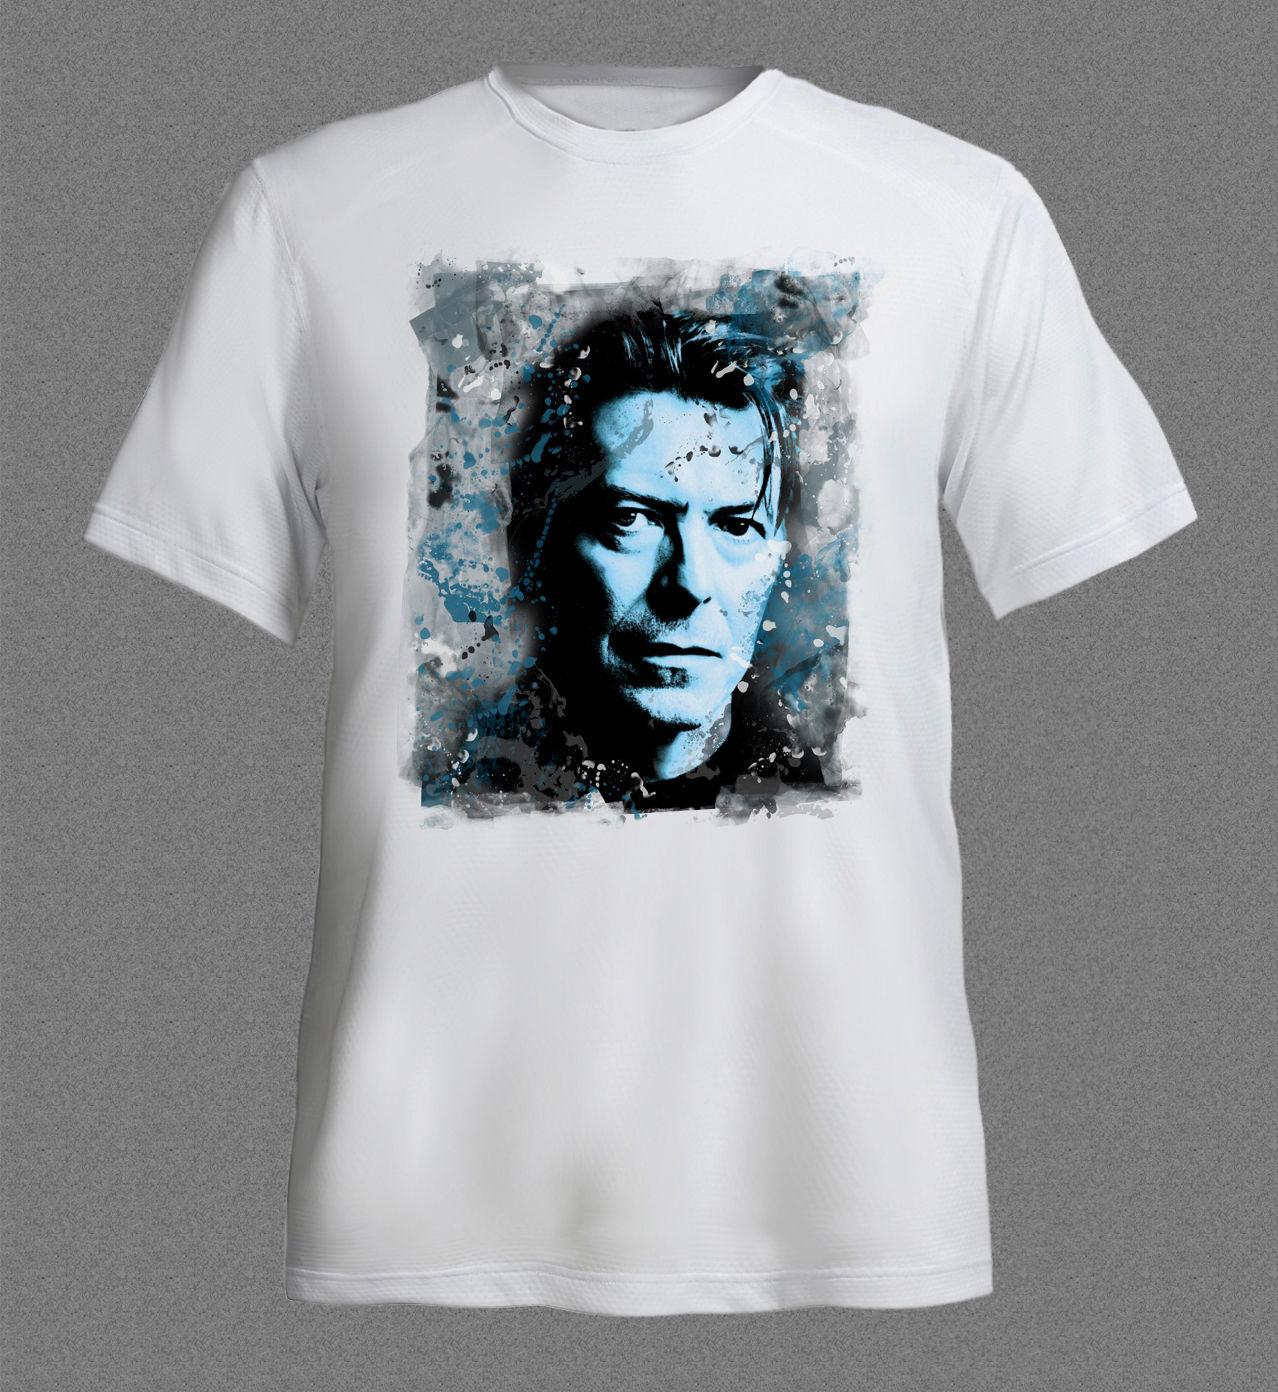 Hipster Tees Summer Mens T Shirt DAVID BOWIE Pop Music cool white T-shirt New Fashion Men'S Short Sleeve